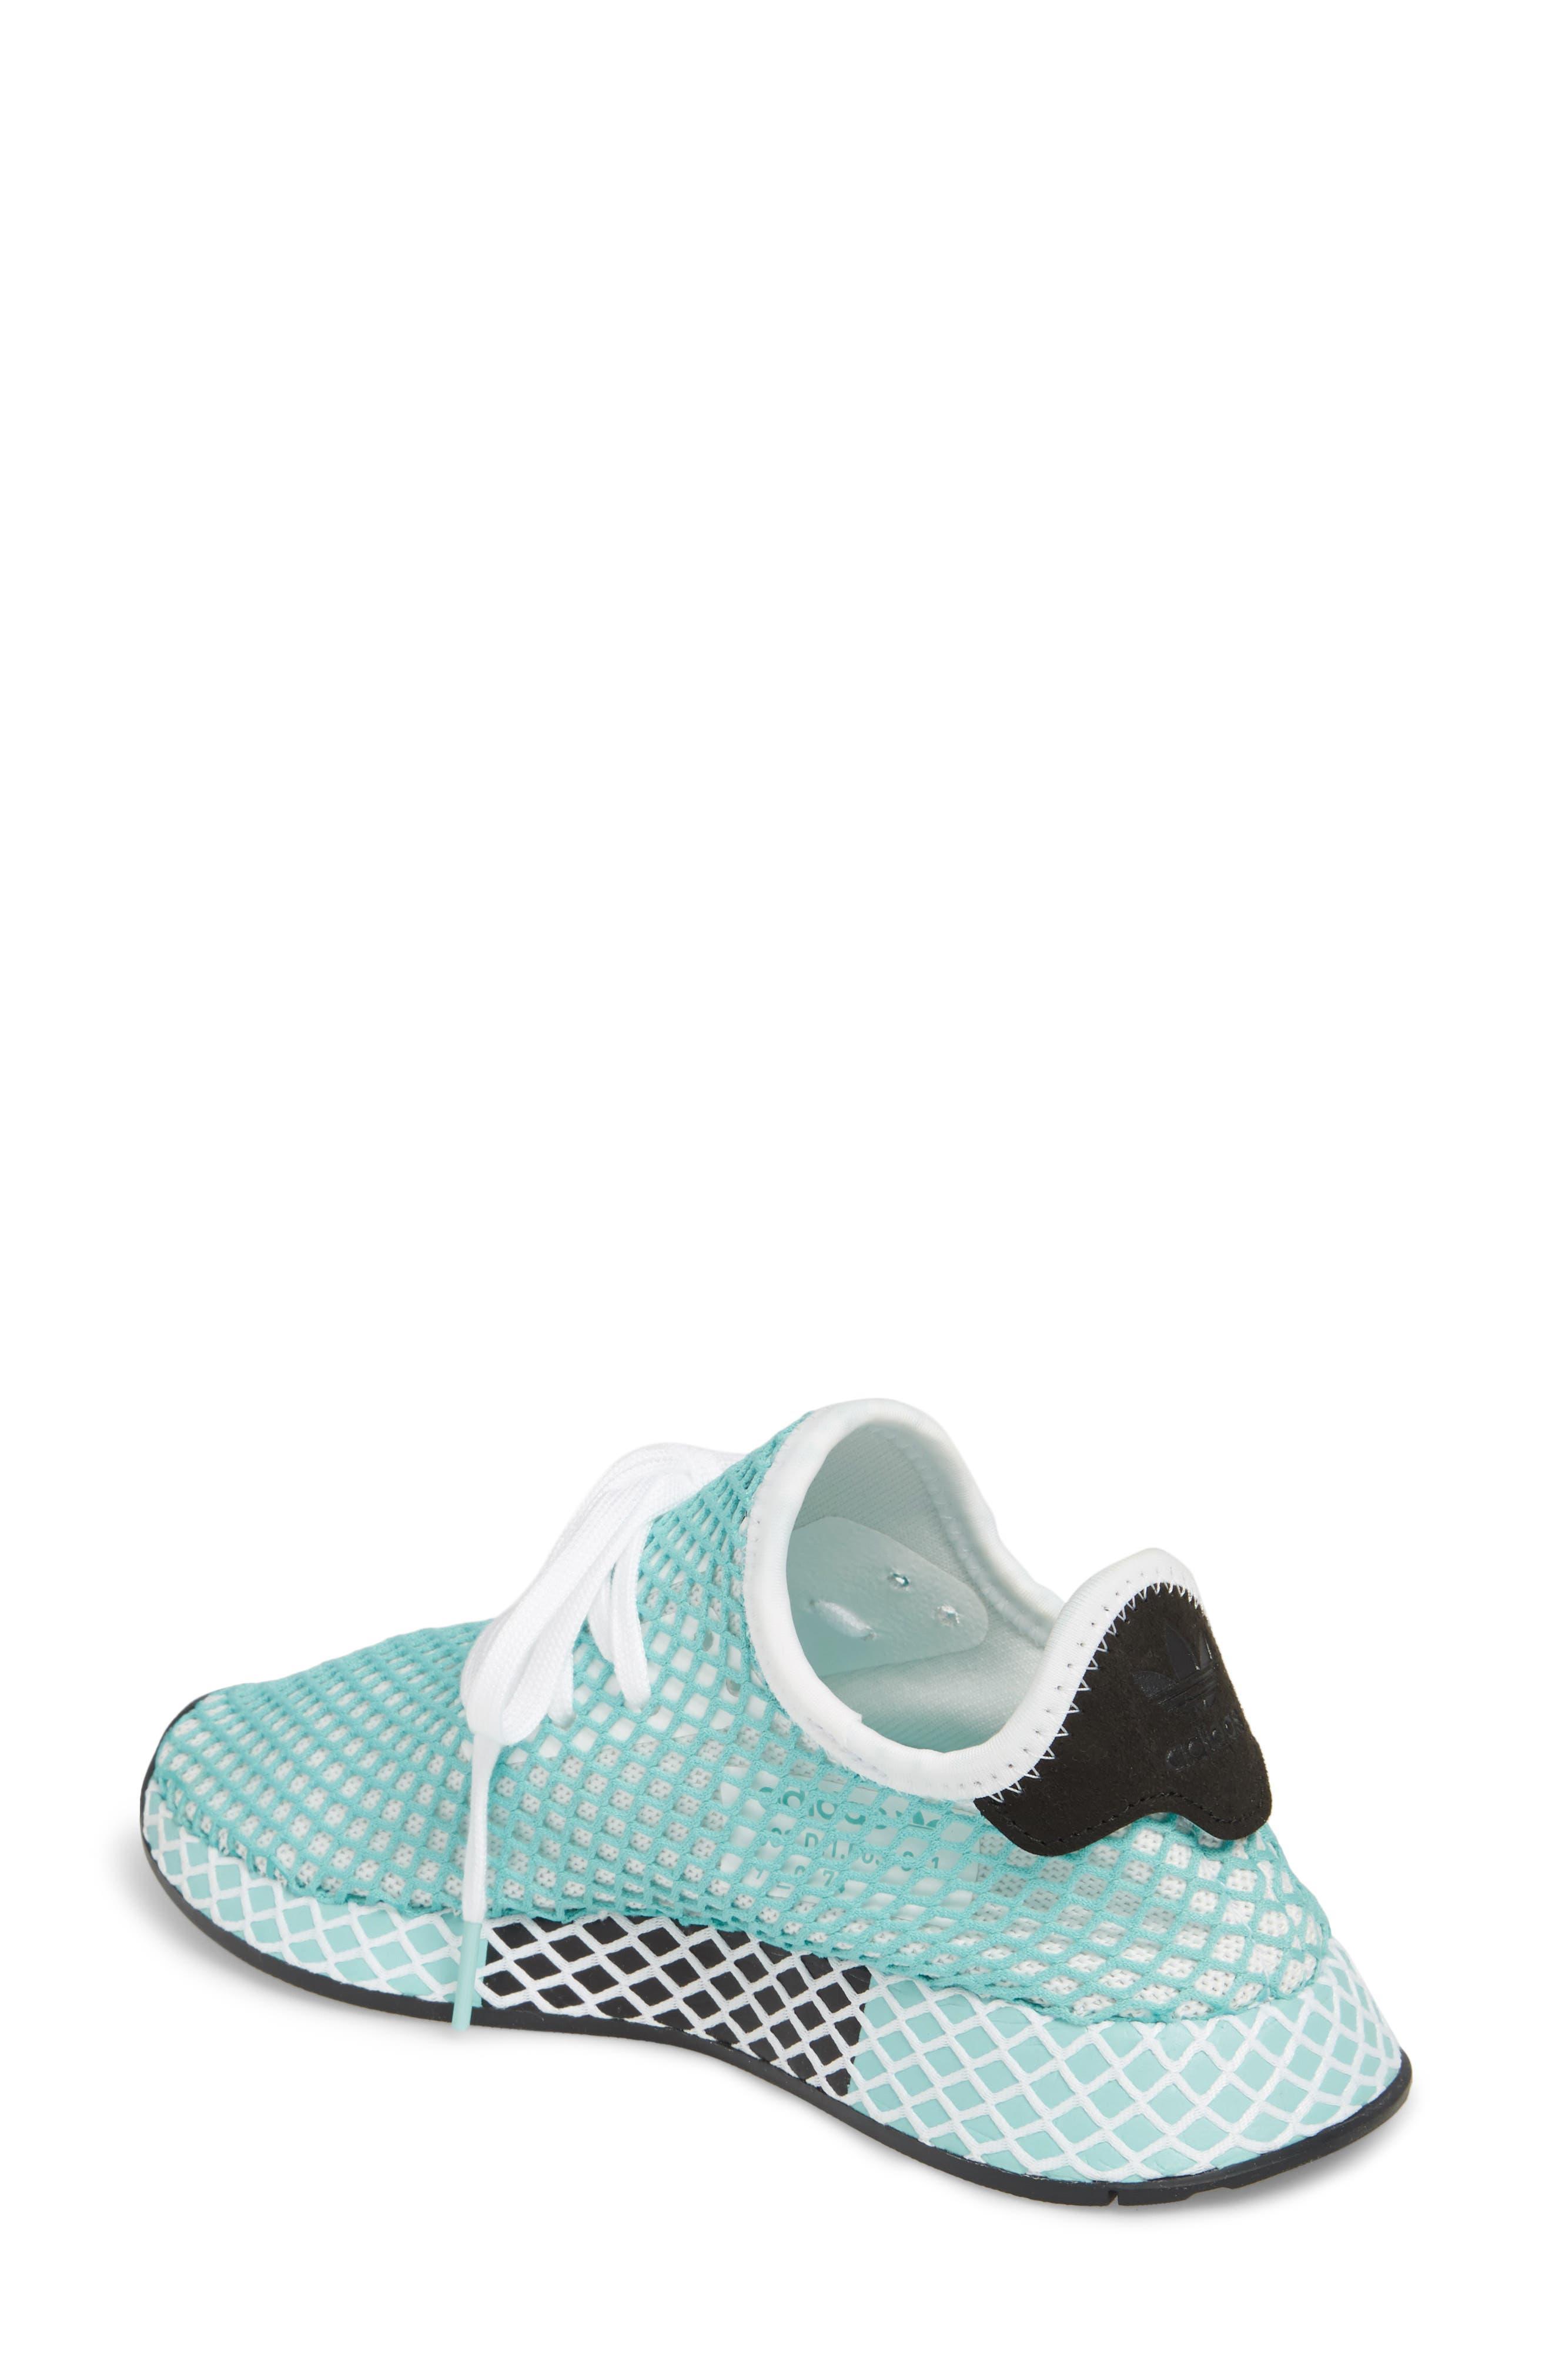 Deerupt x Parley Runner Sneaker,                             Alternate thumbnail 2, color,